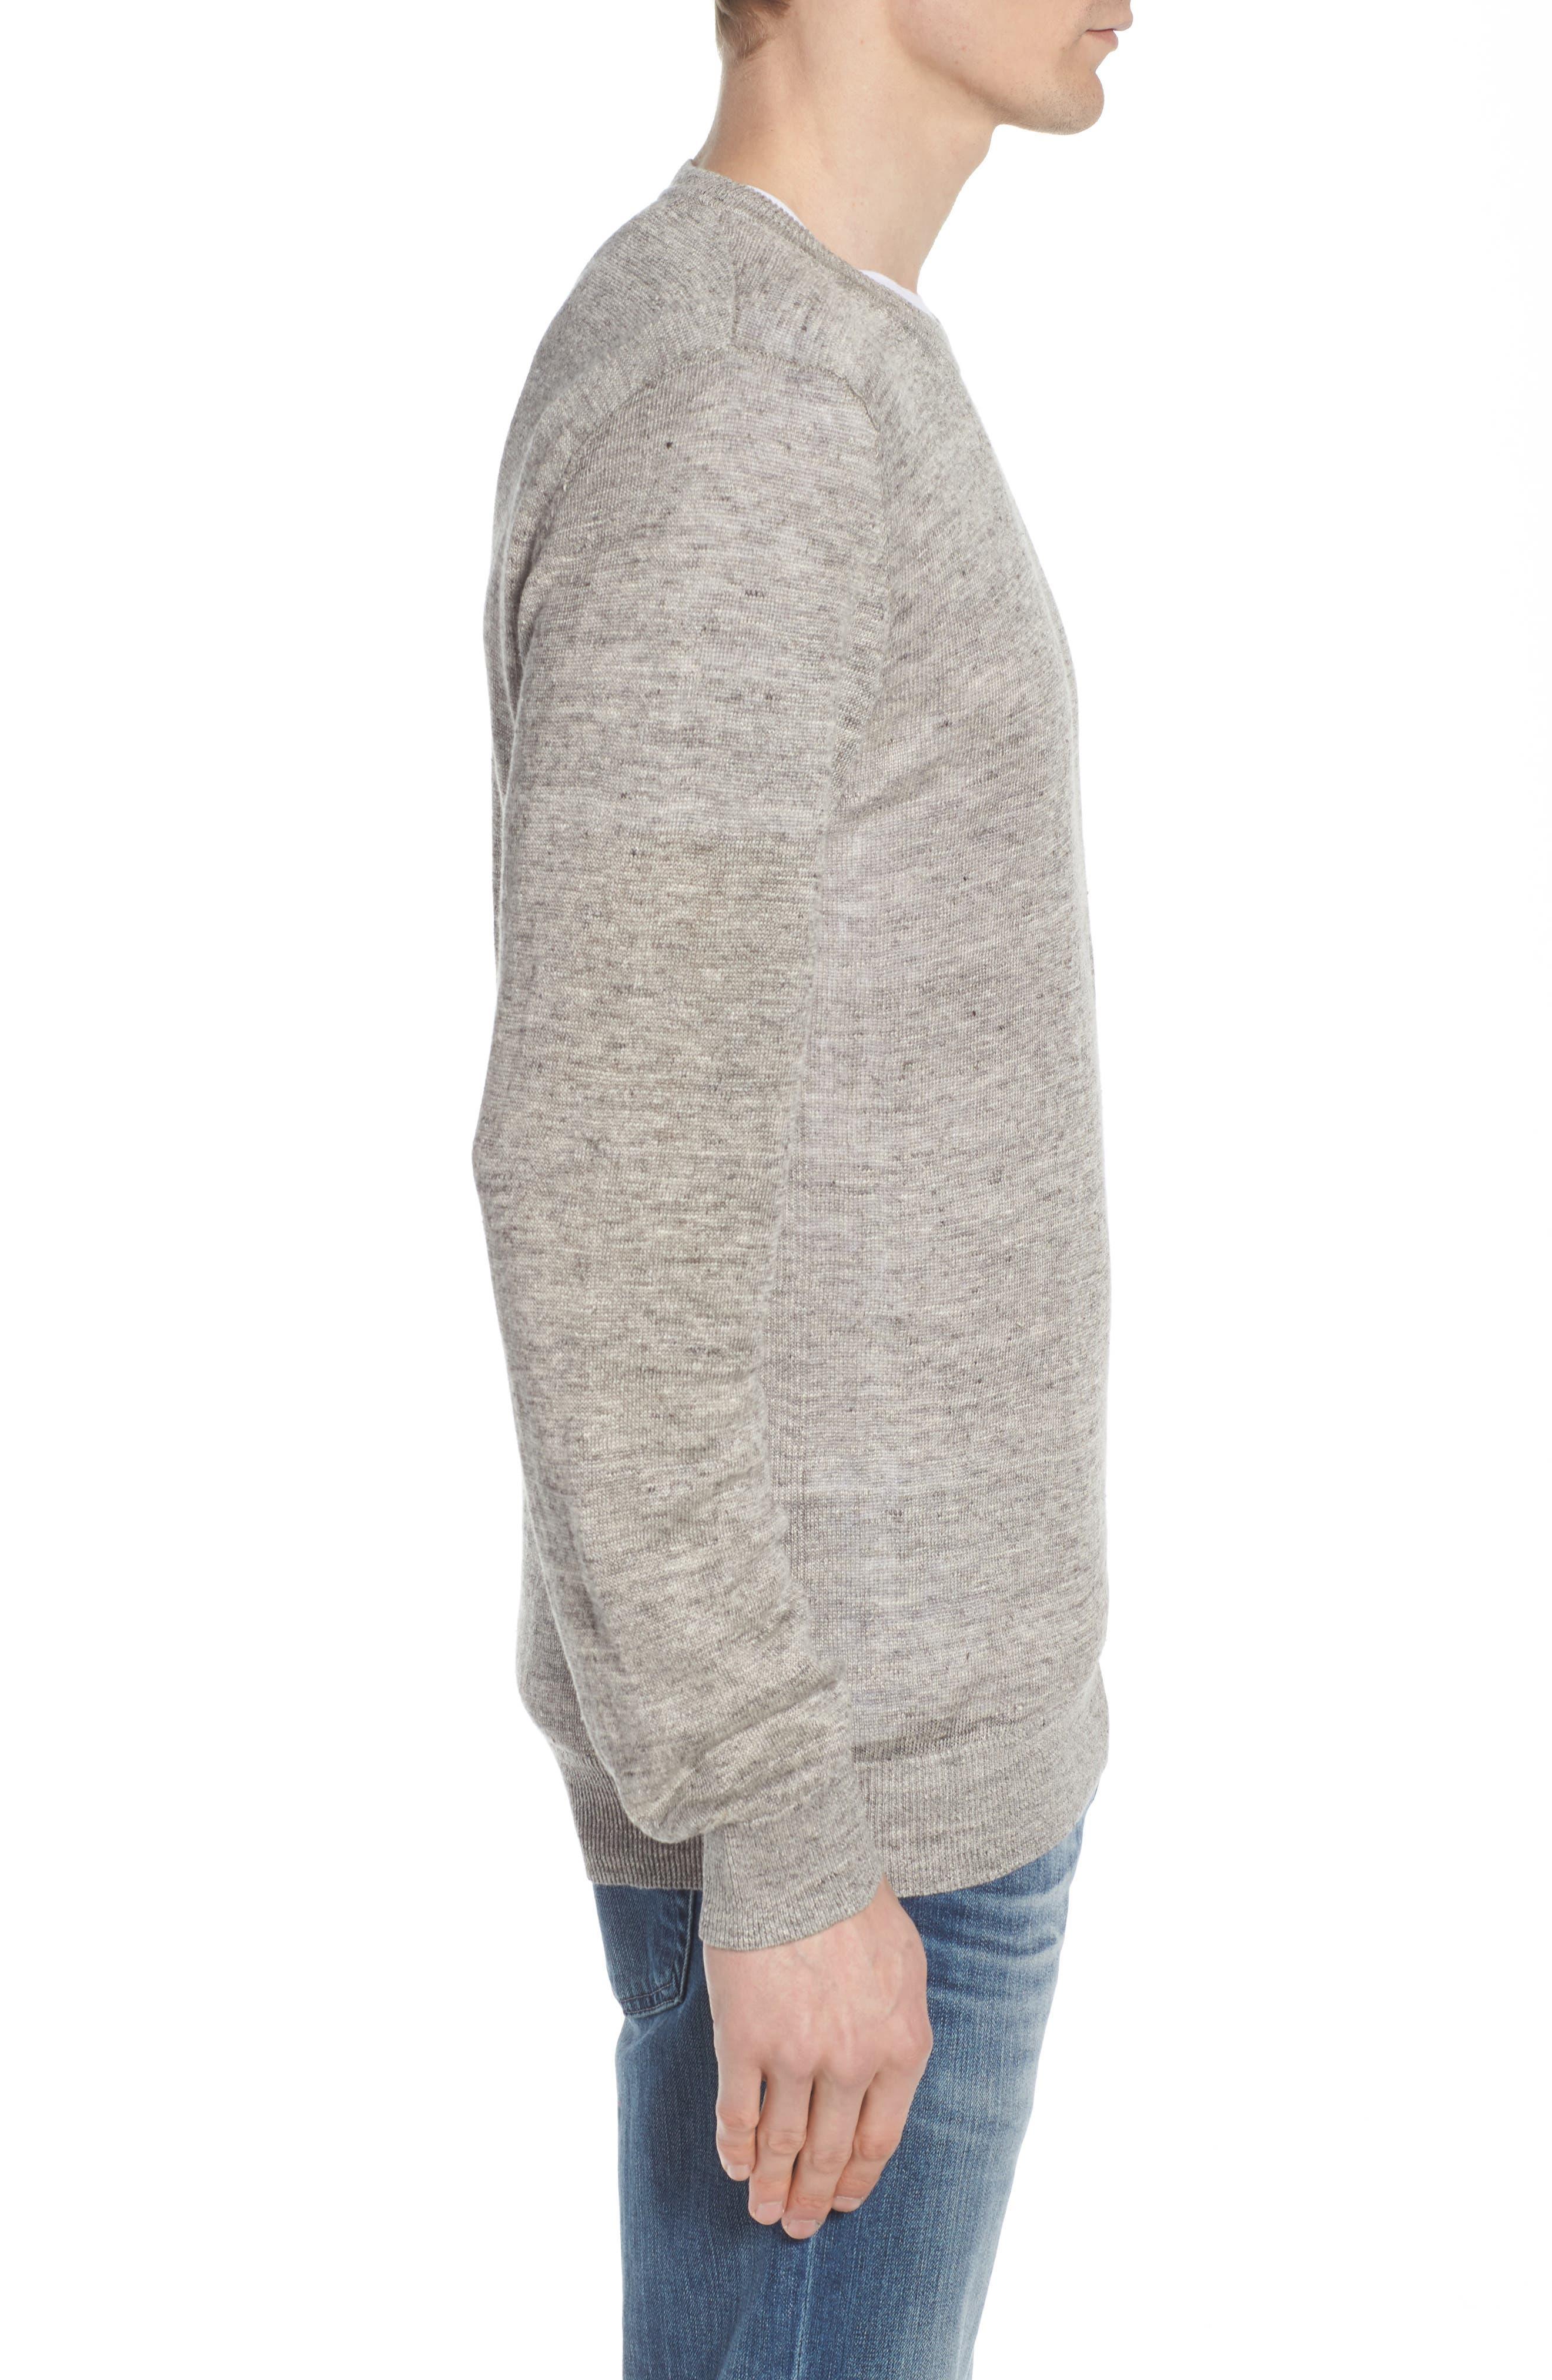 Heyward Long Sleeve T-Shirt,                             Alternate thumbnail 3, color,                             Heather Grey